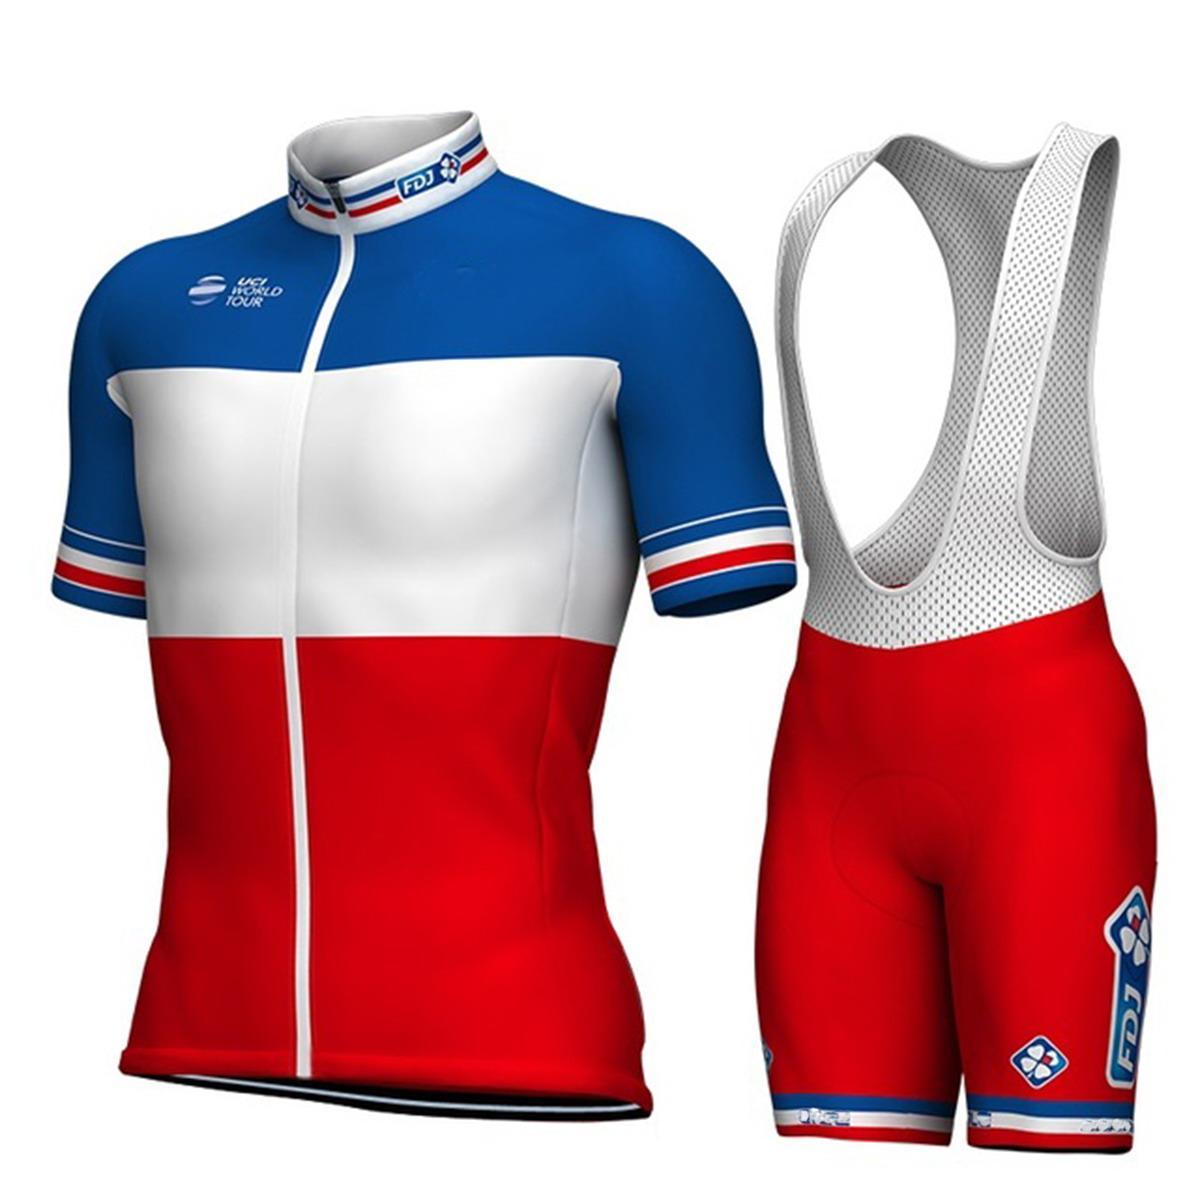 2018 Groupama Fdj Pro Team 프랑스 반소매 사이클링 저지 여름 자전거 타기 Ropa Ciclismo + Bib 반바지 3D 젤 패드 세트 크기 : XS -4xl